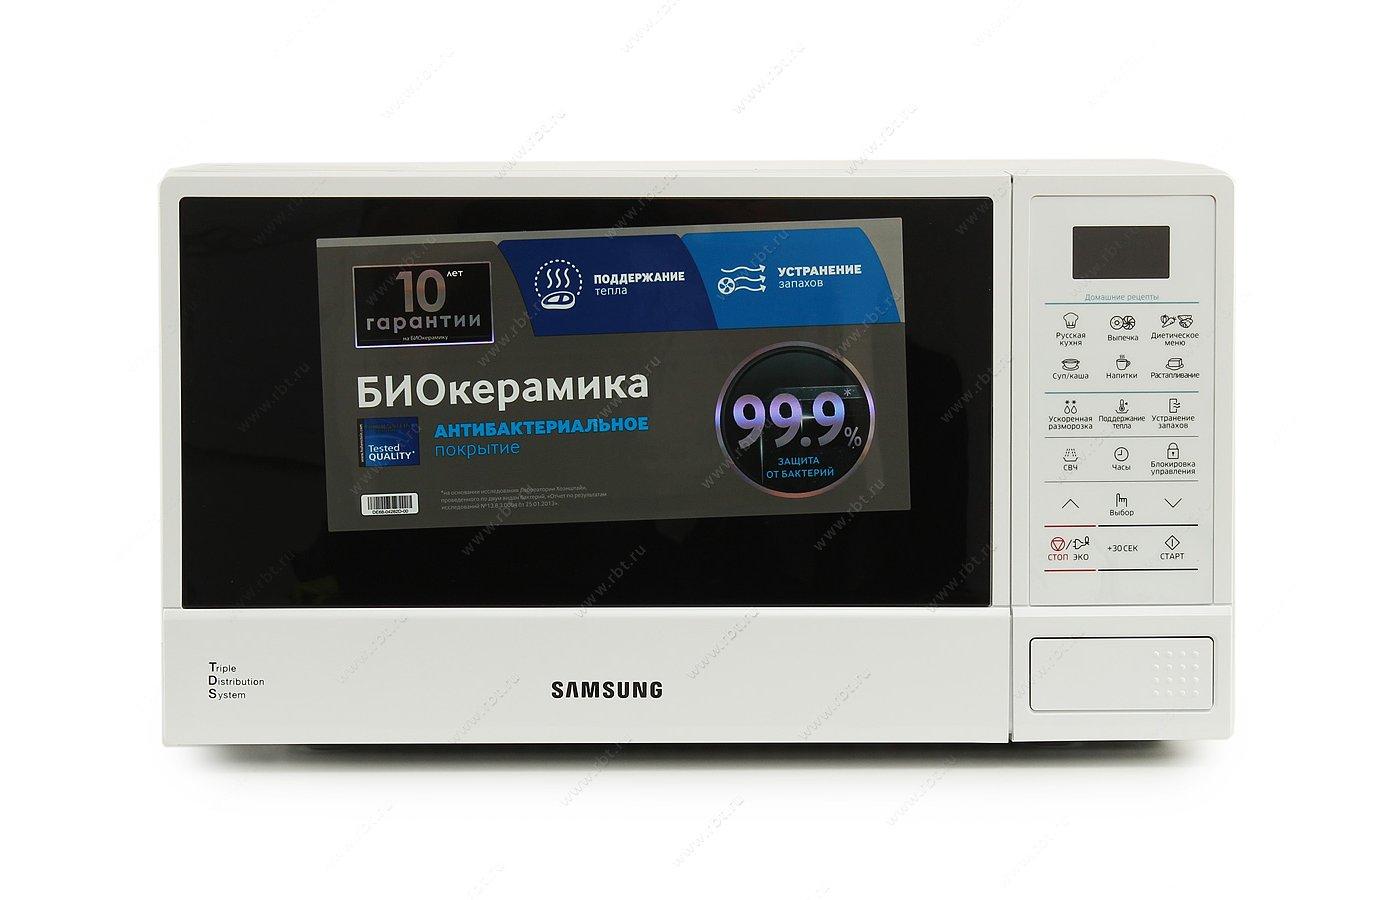 Микроволновая печь SAMSUNG ME-83DRQW-1/BW